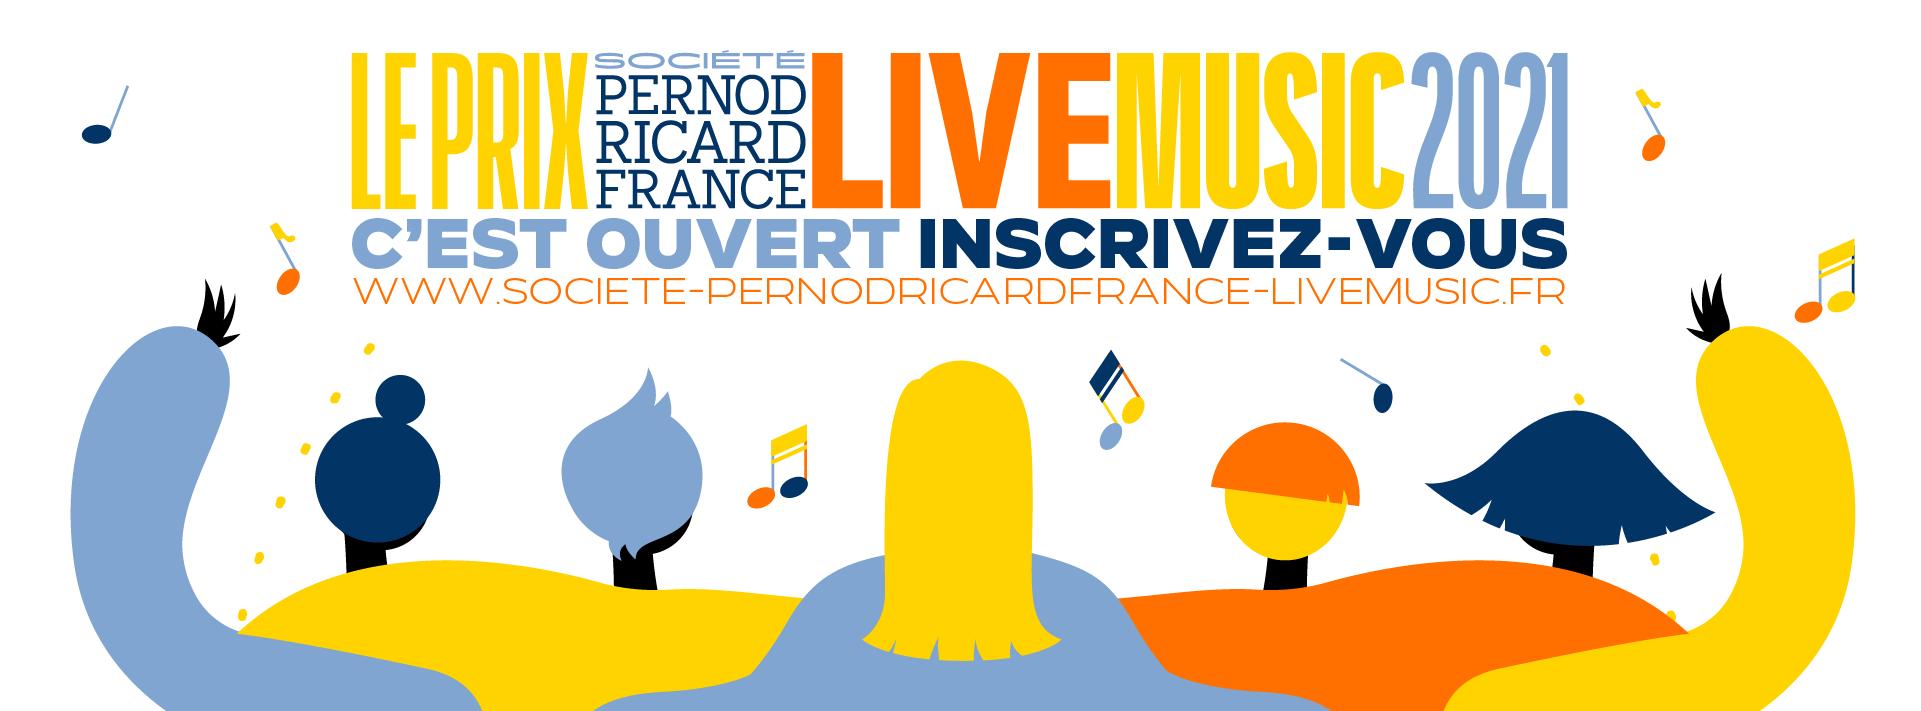 Prix Société Pernod Ricard France Live Music 2021